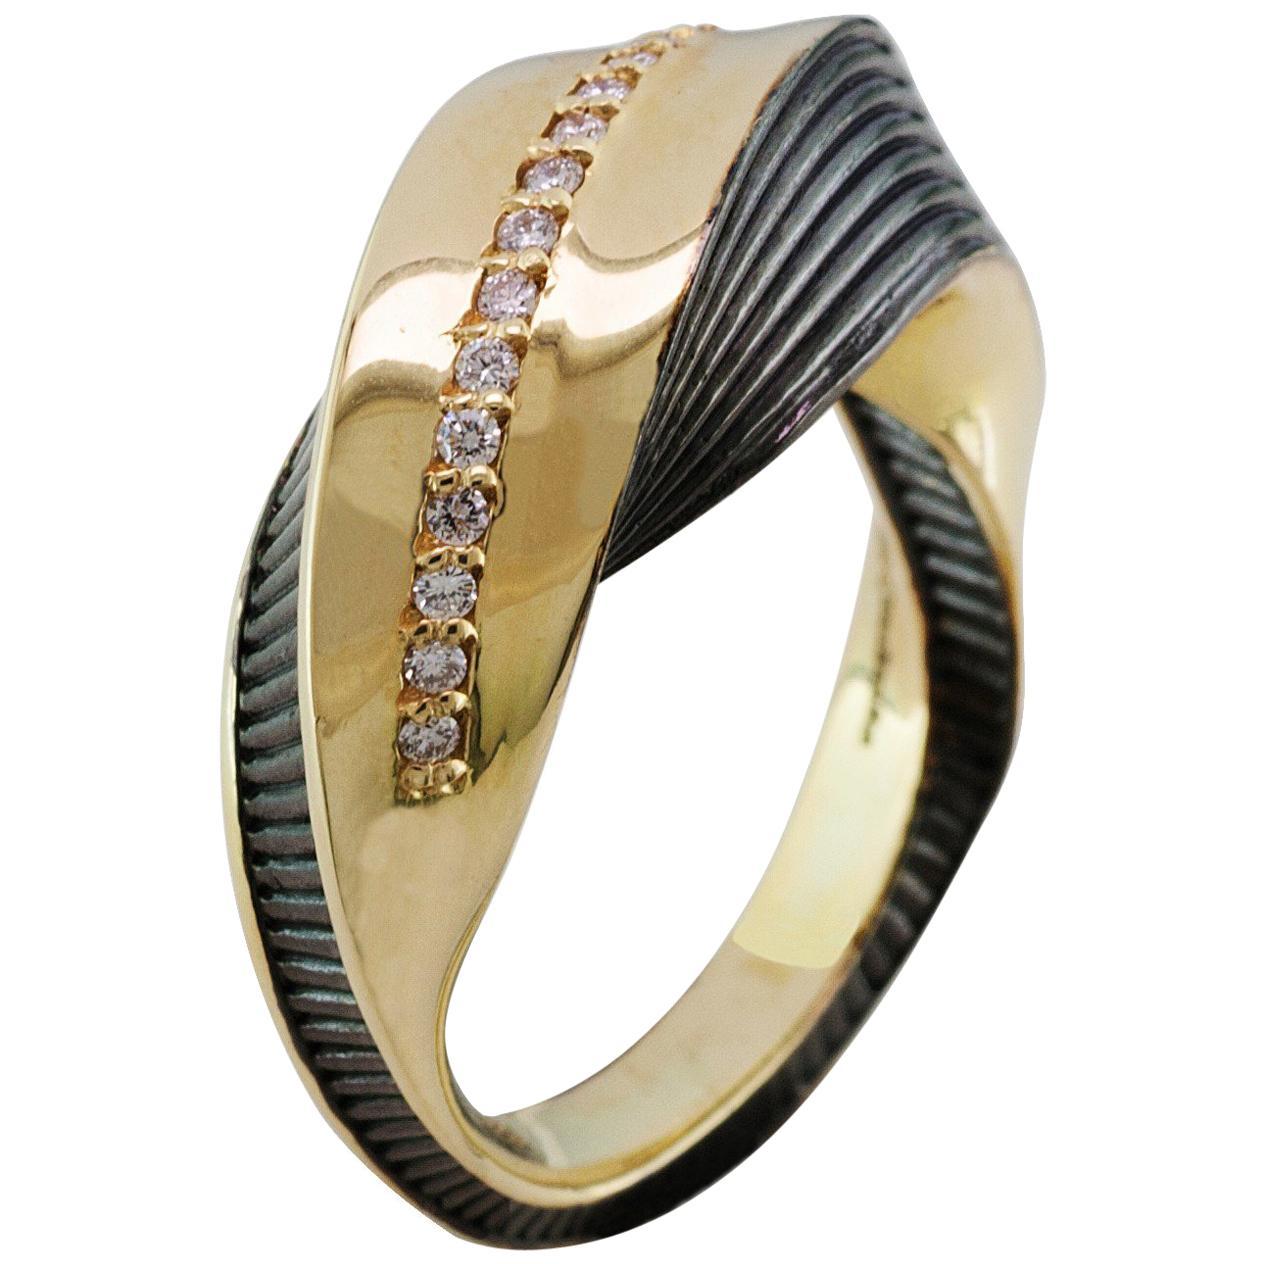 Georgios Collections 18 Karat Yellow Gold Diamond Ring with Black Rhodium